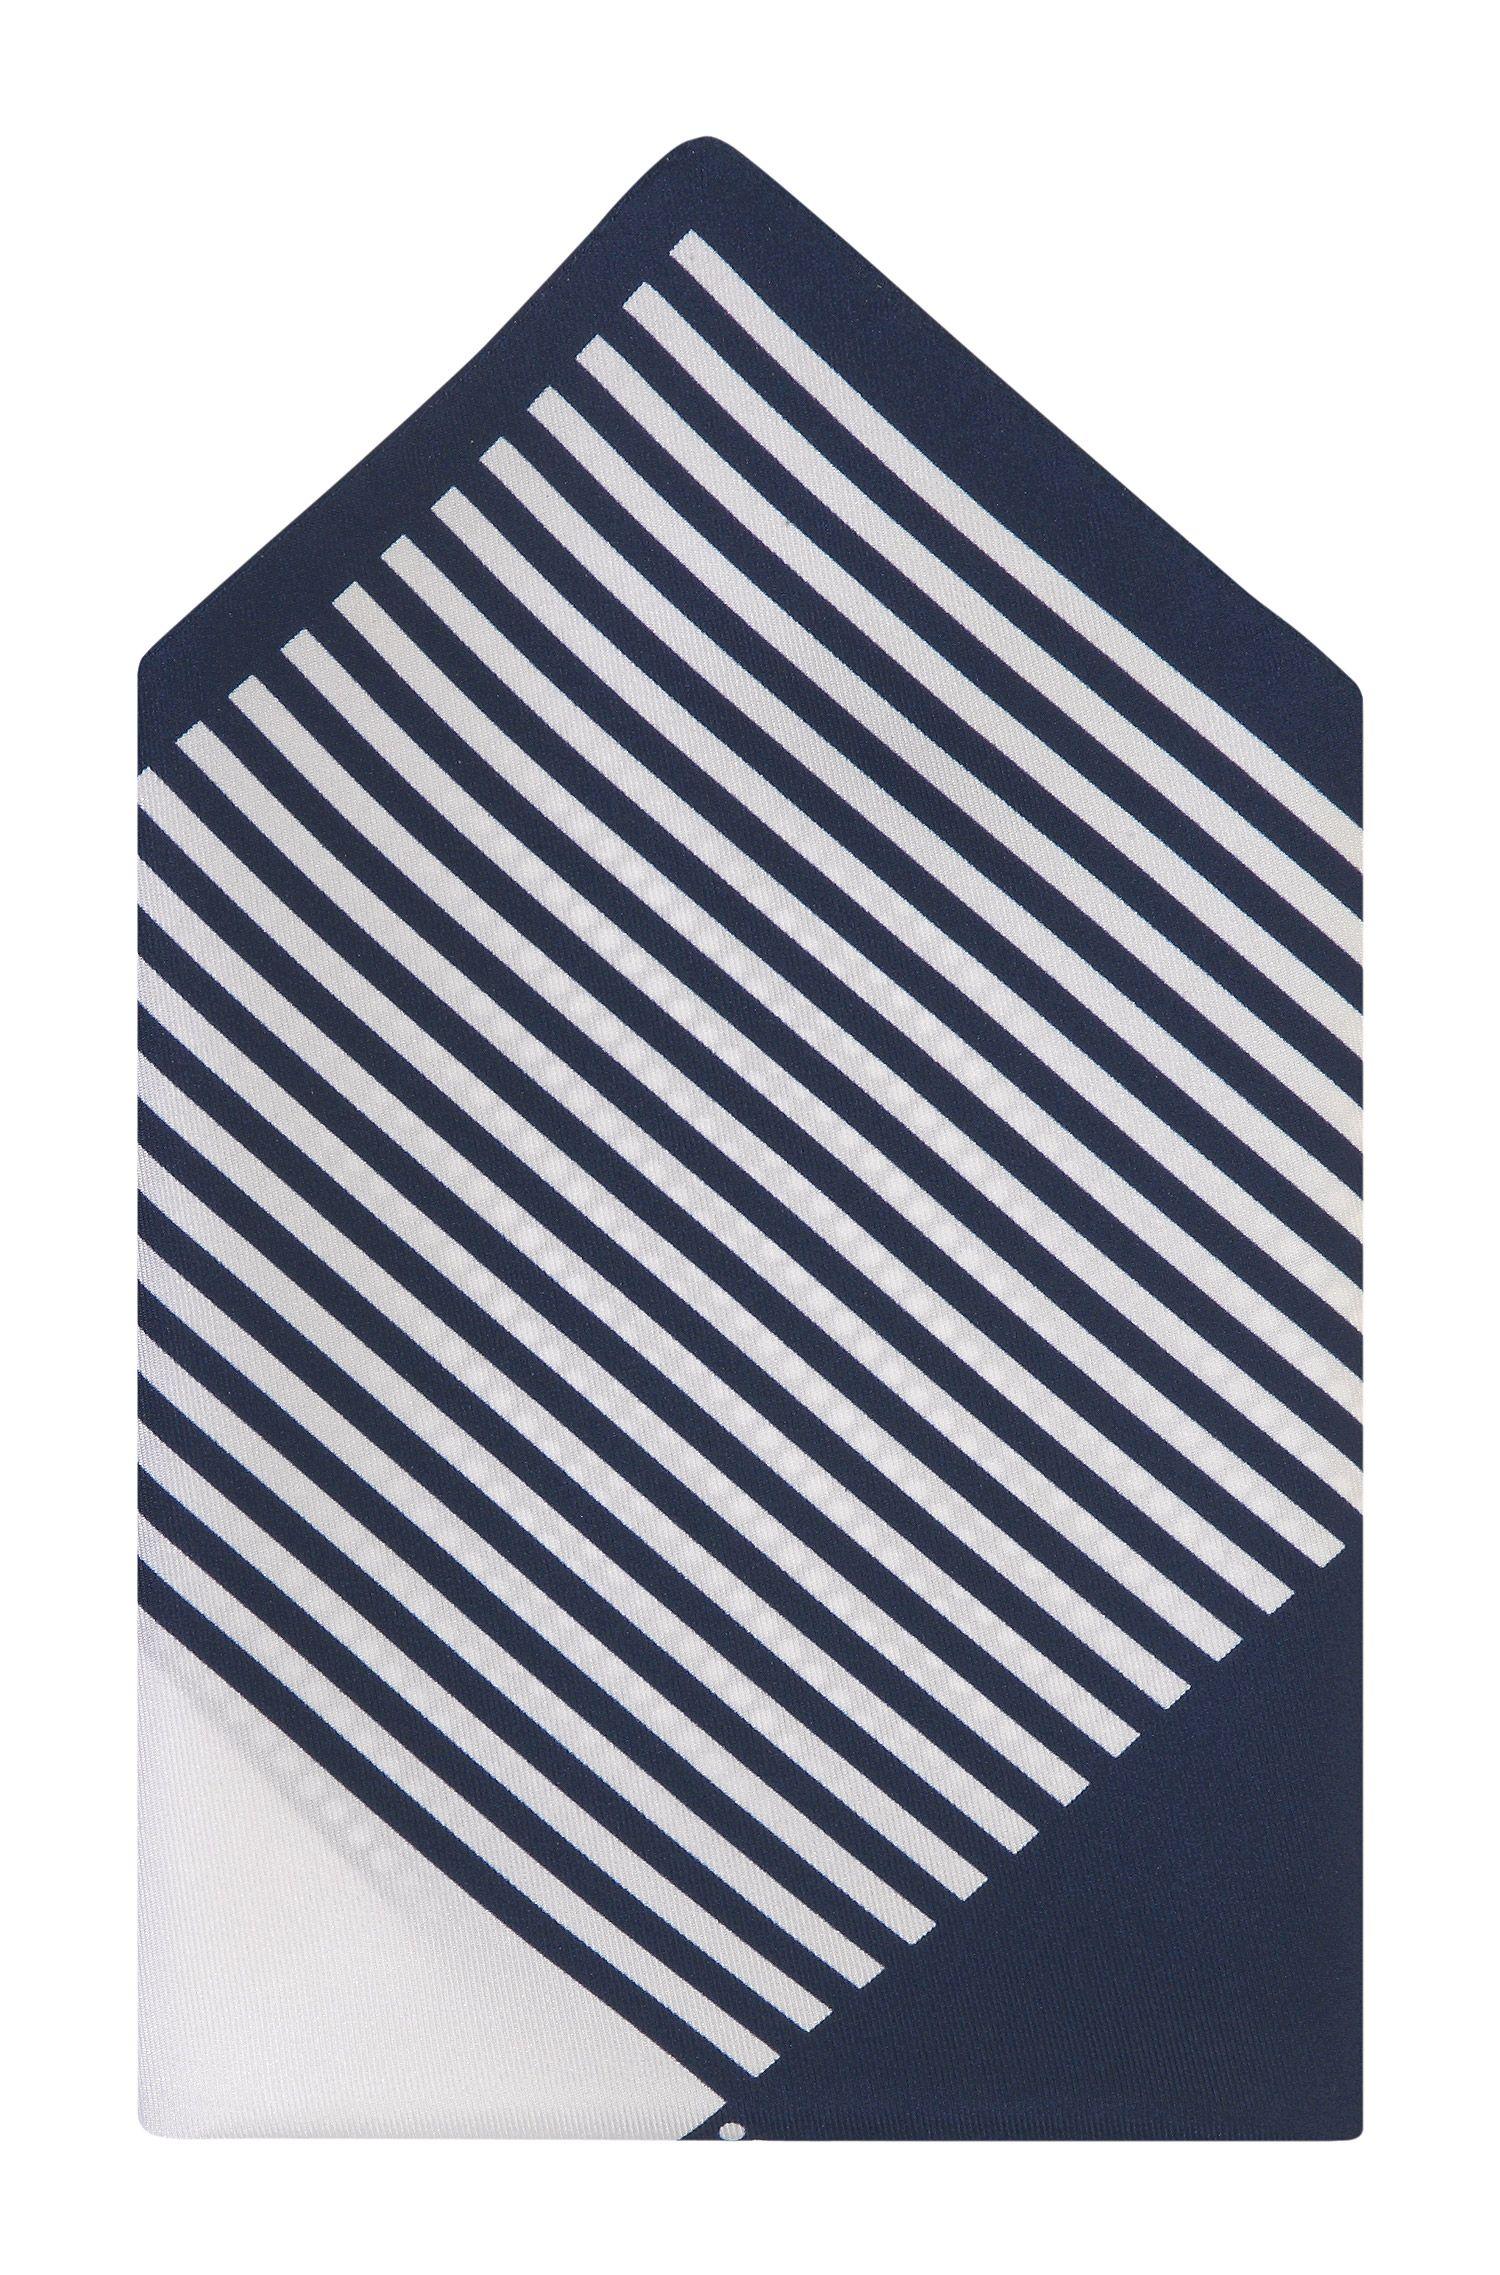 Pochette en soie, Pocket square 33x33